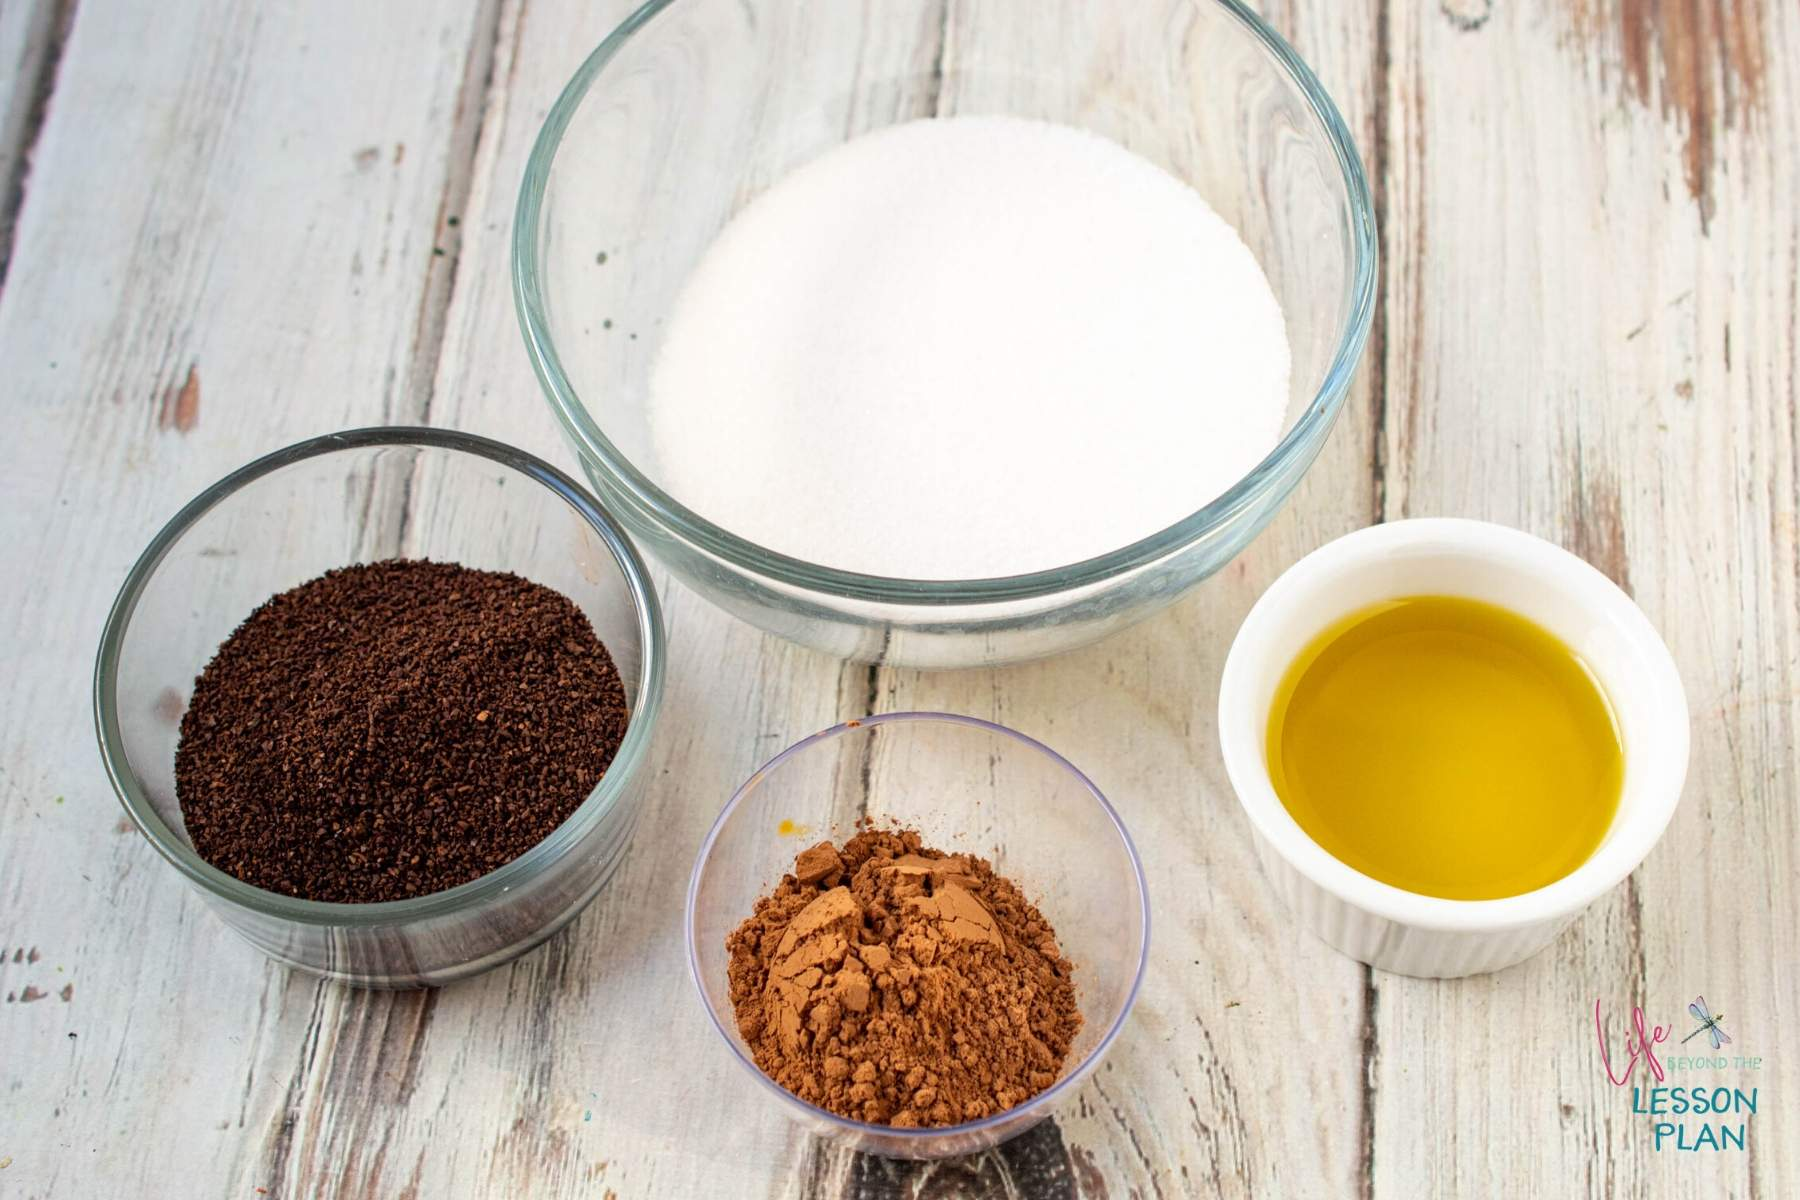 DIY Mocha Body Scrub ingredients in separate bowls